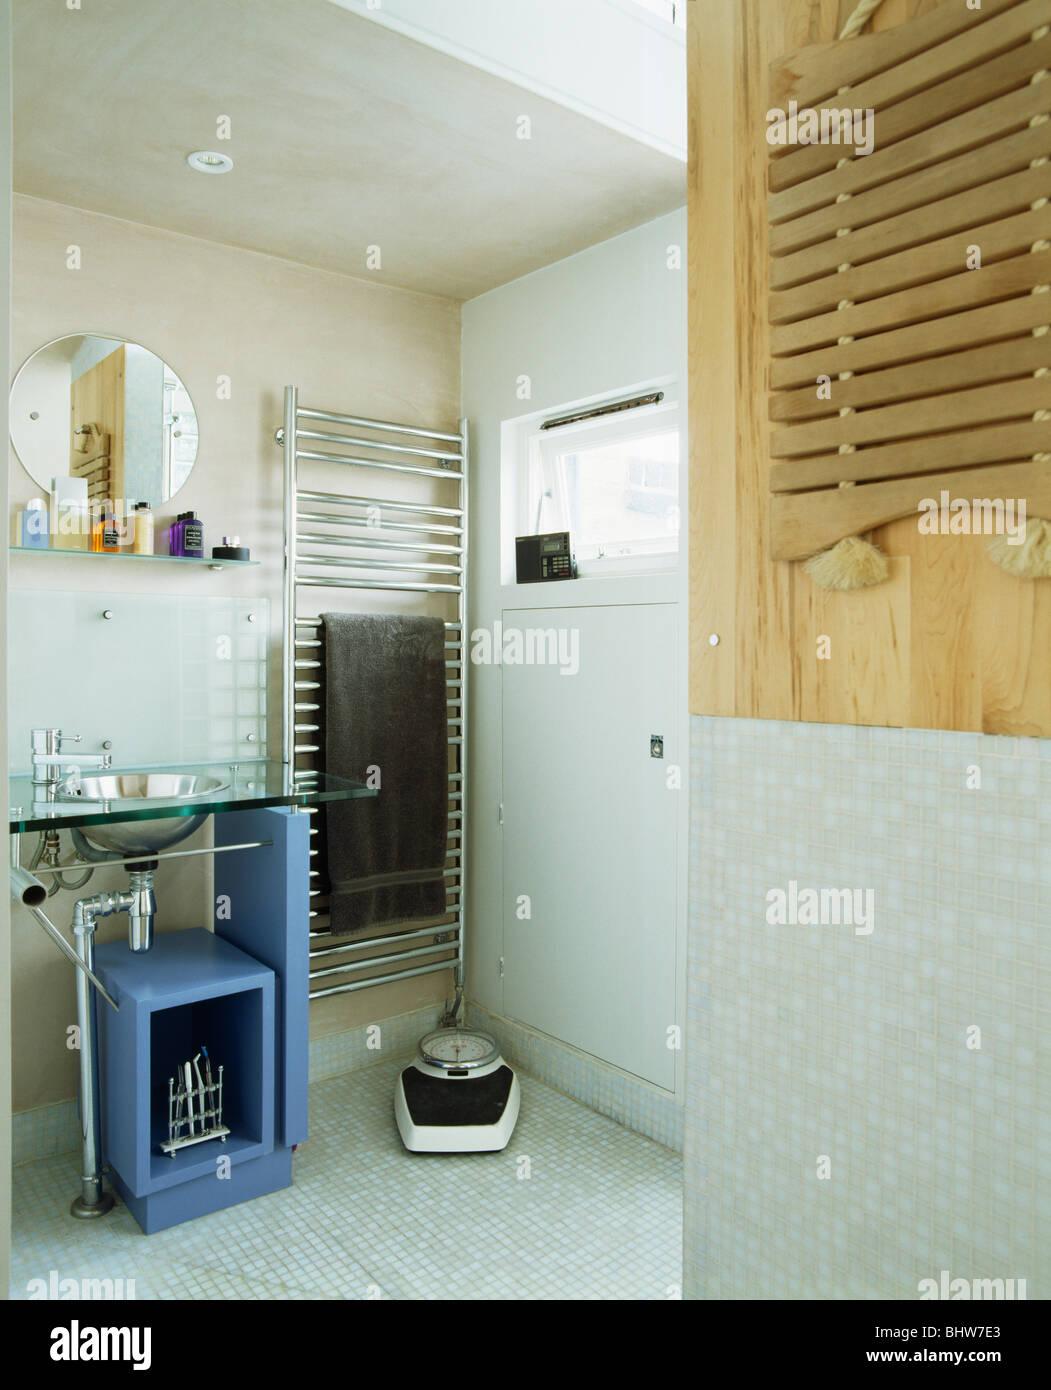 Blue Shelf Unit Below Glass And Basin In Small Modern White Bathroom Stock Photo Alamy